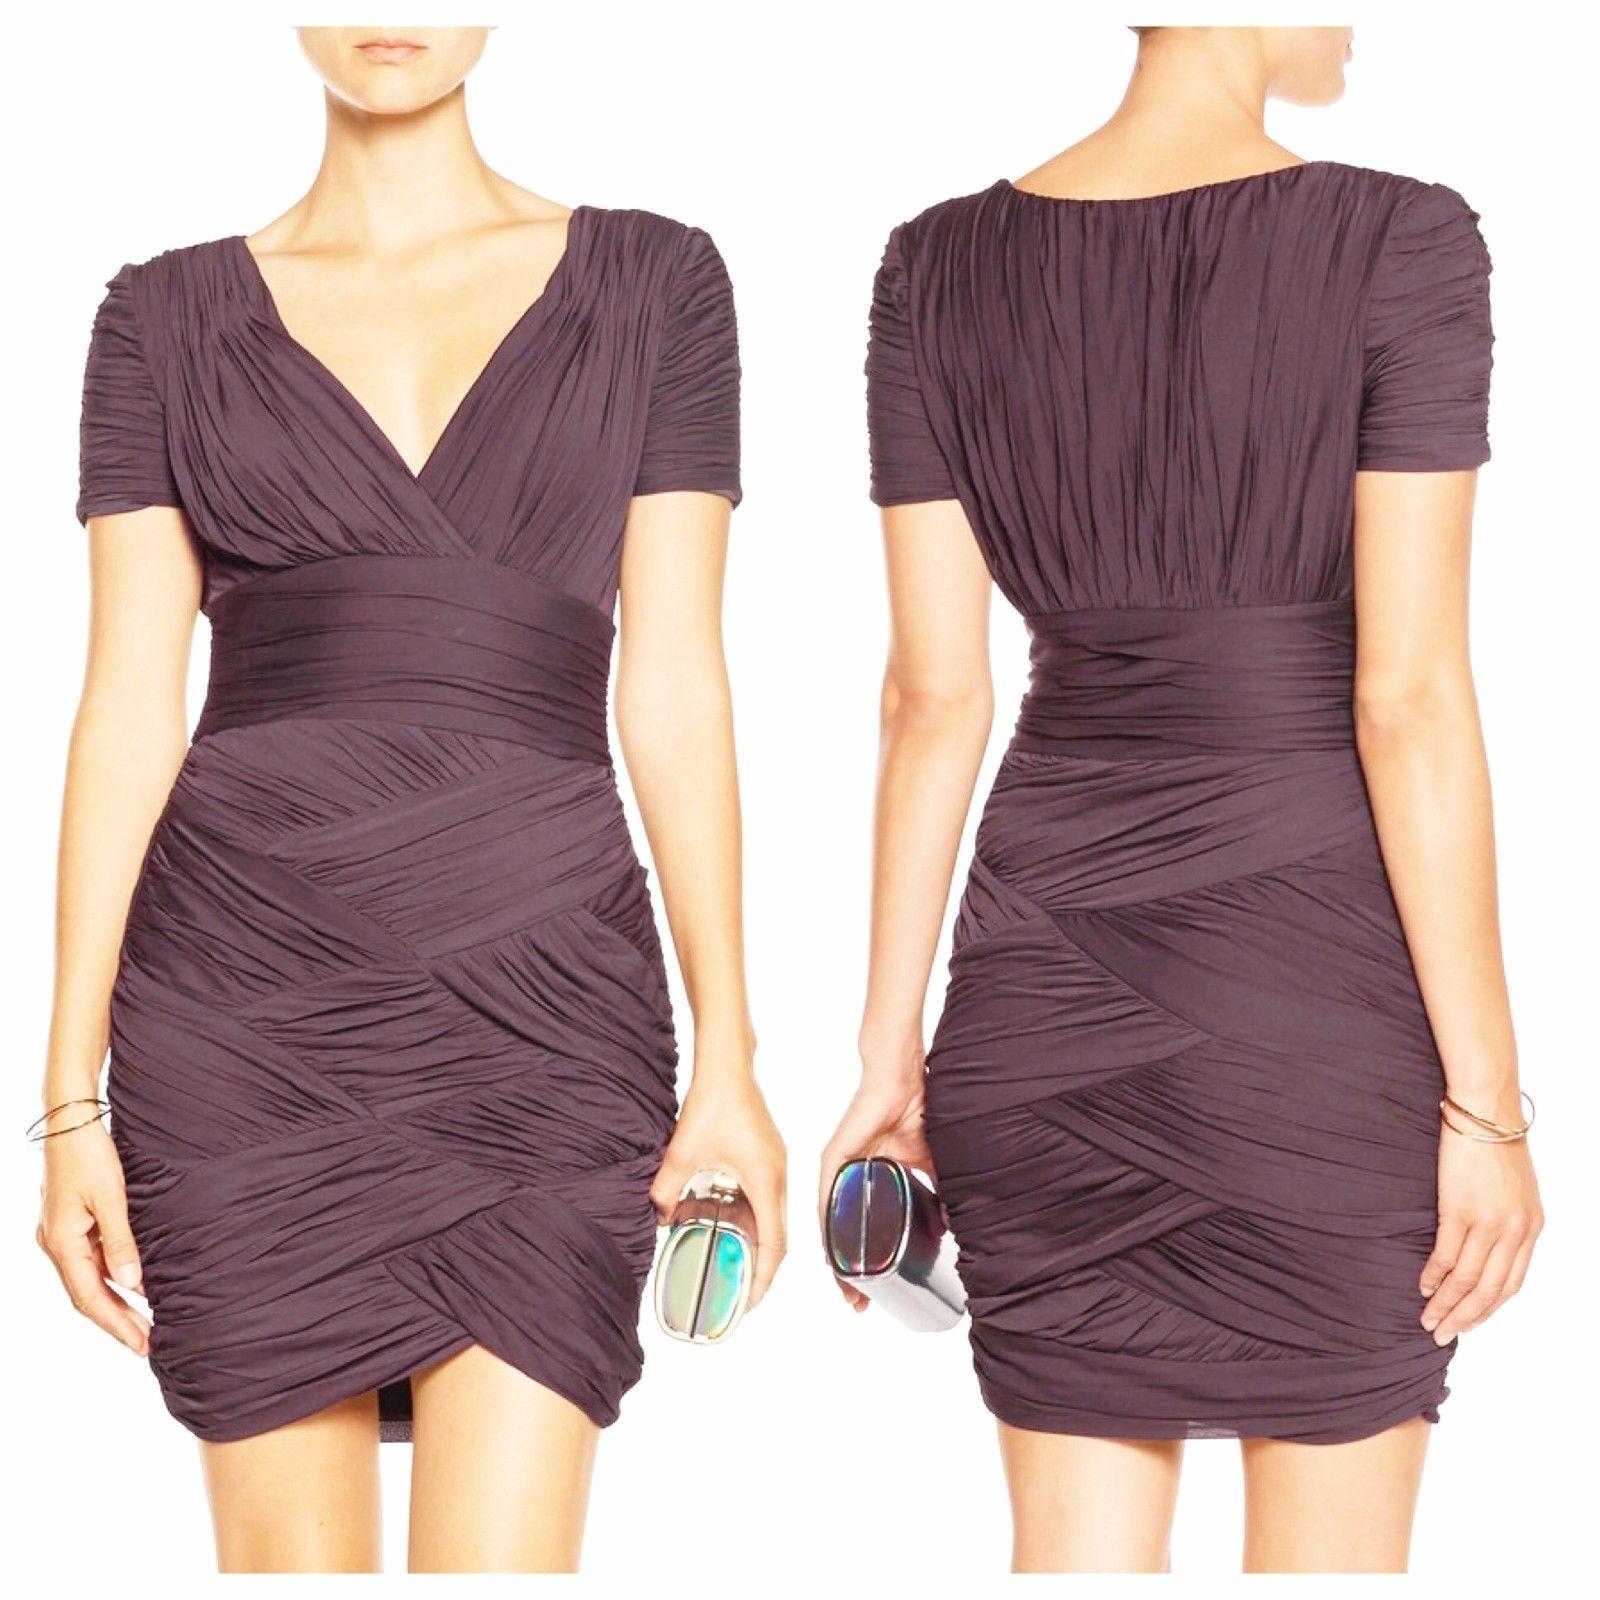 NWT Halston Heritage Ruched Jersey Mini Bodycon Dress Purple Aubergine XS 0 2